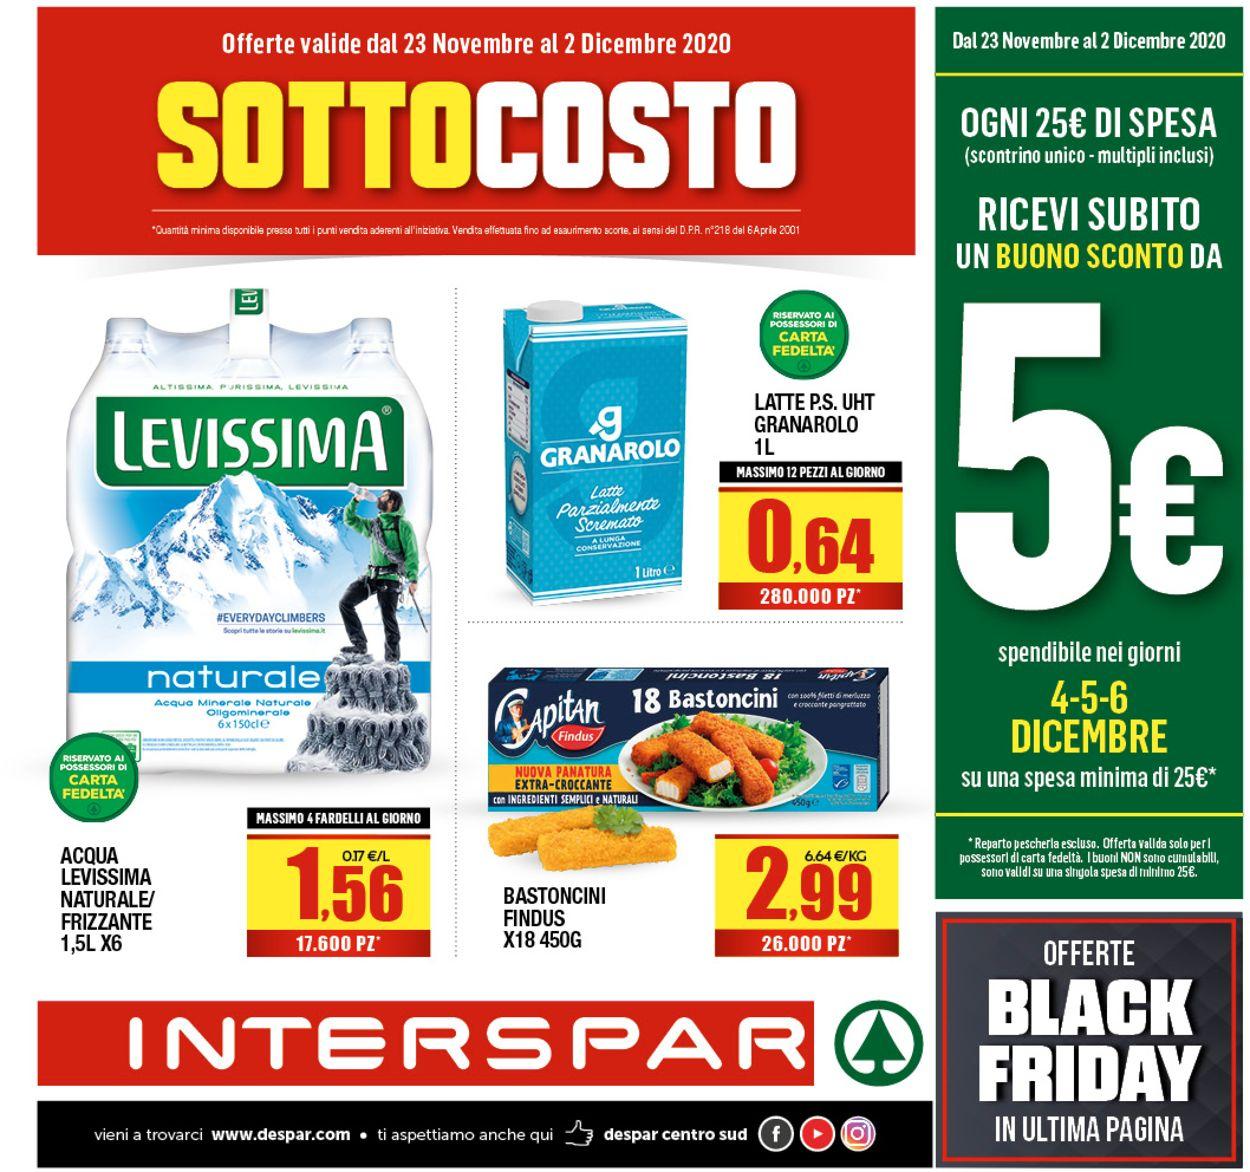 Volantino Interspar - Black Friday 2020 - Offerte 23/11-02/12/2020